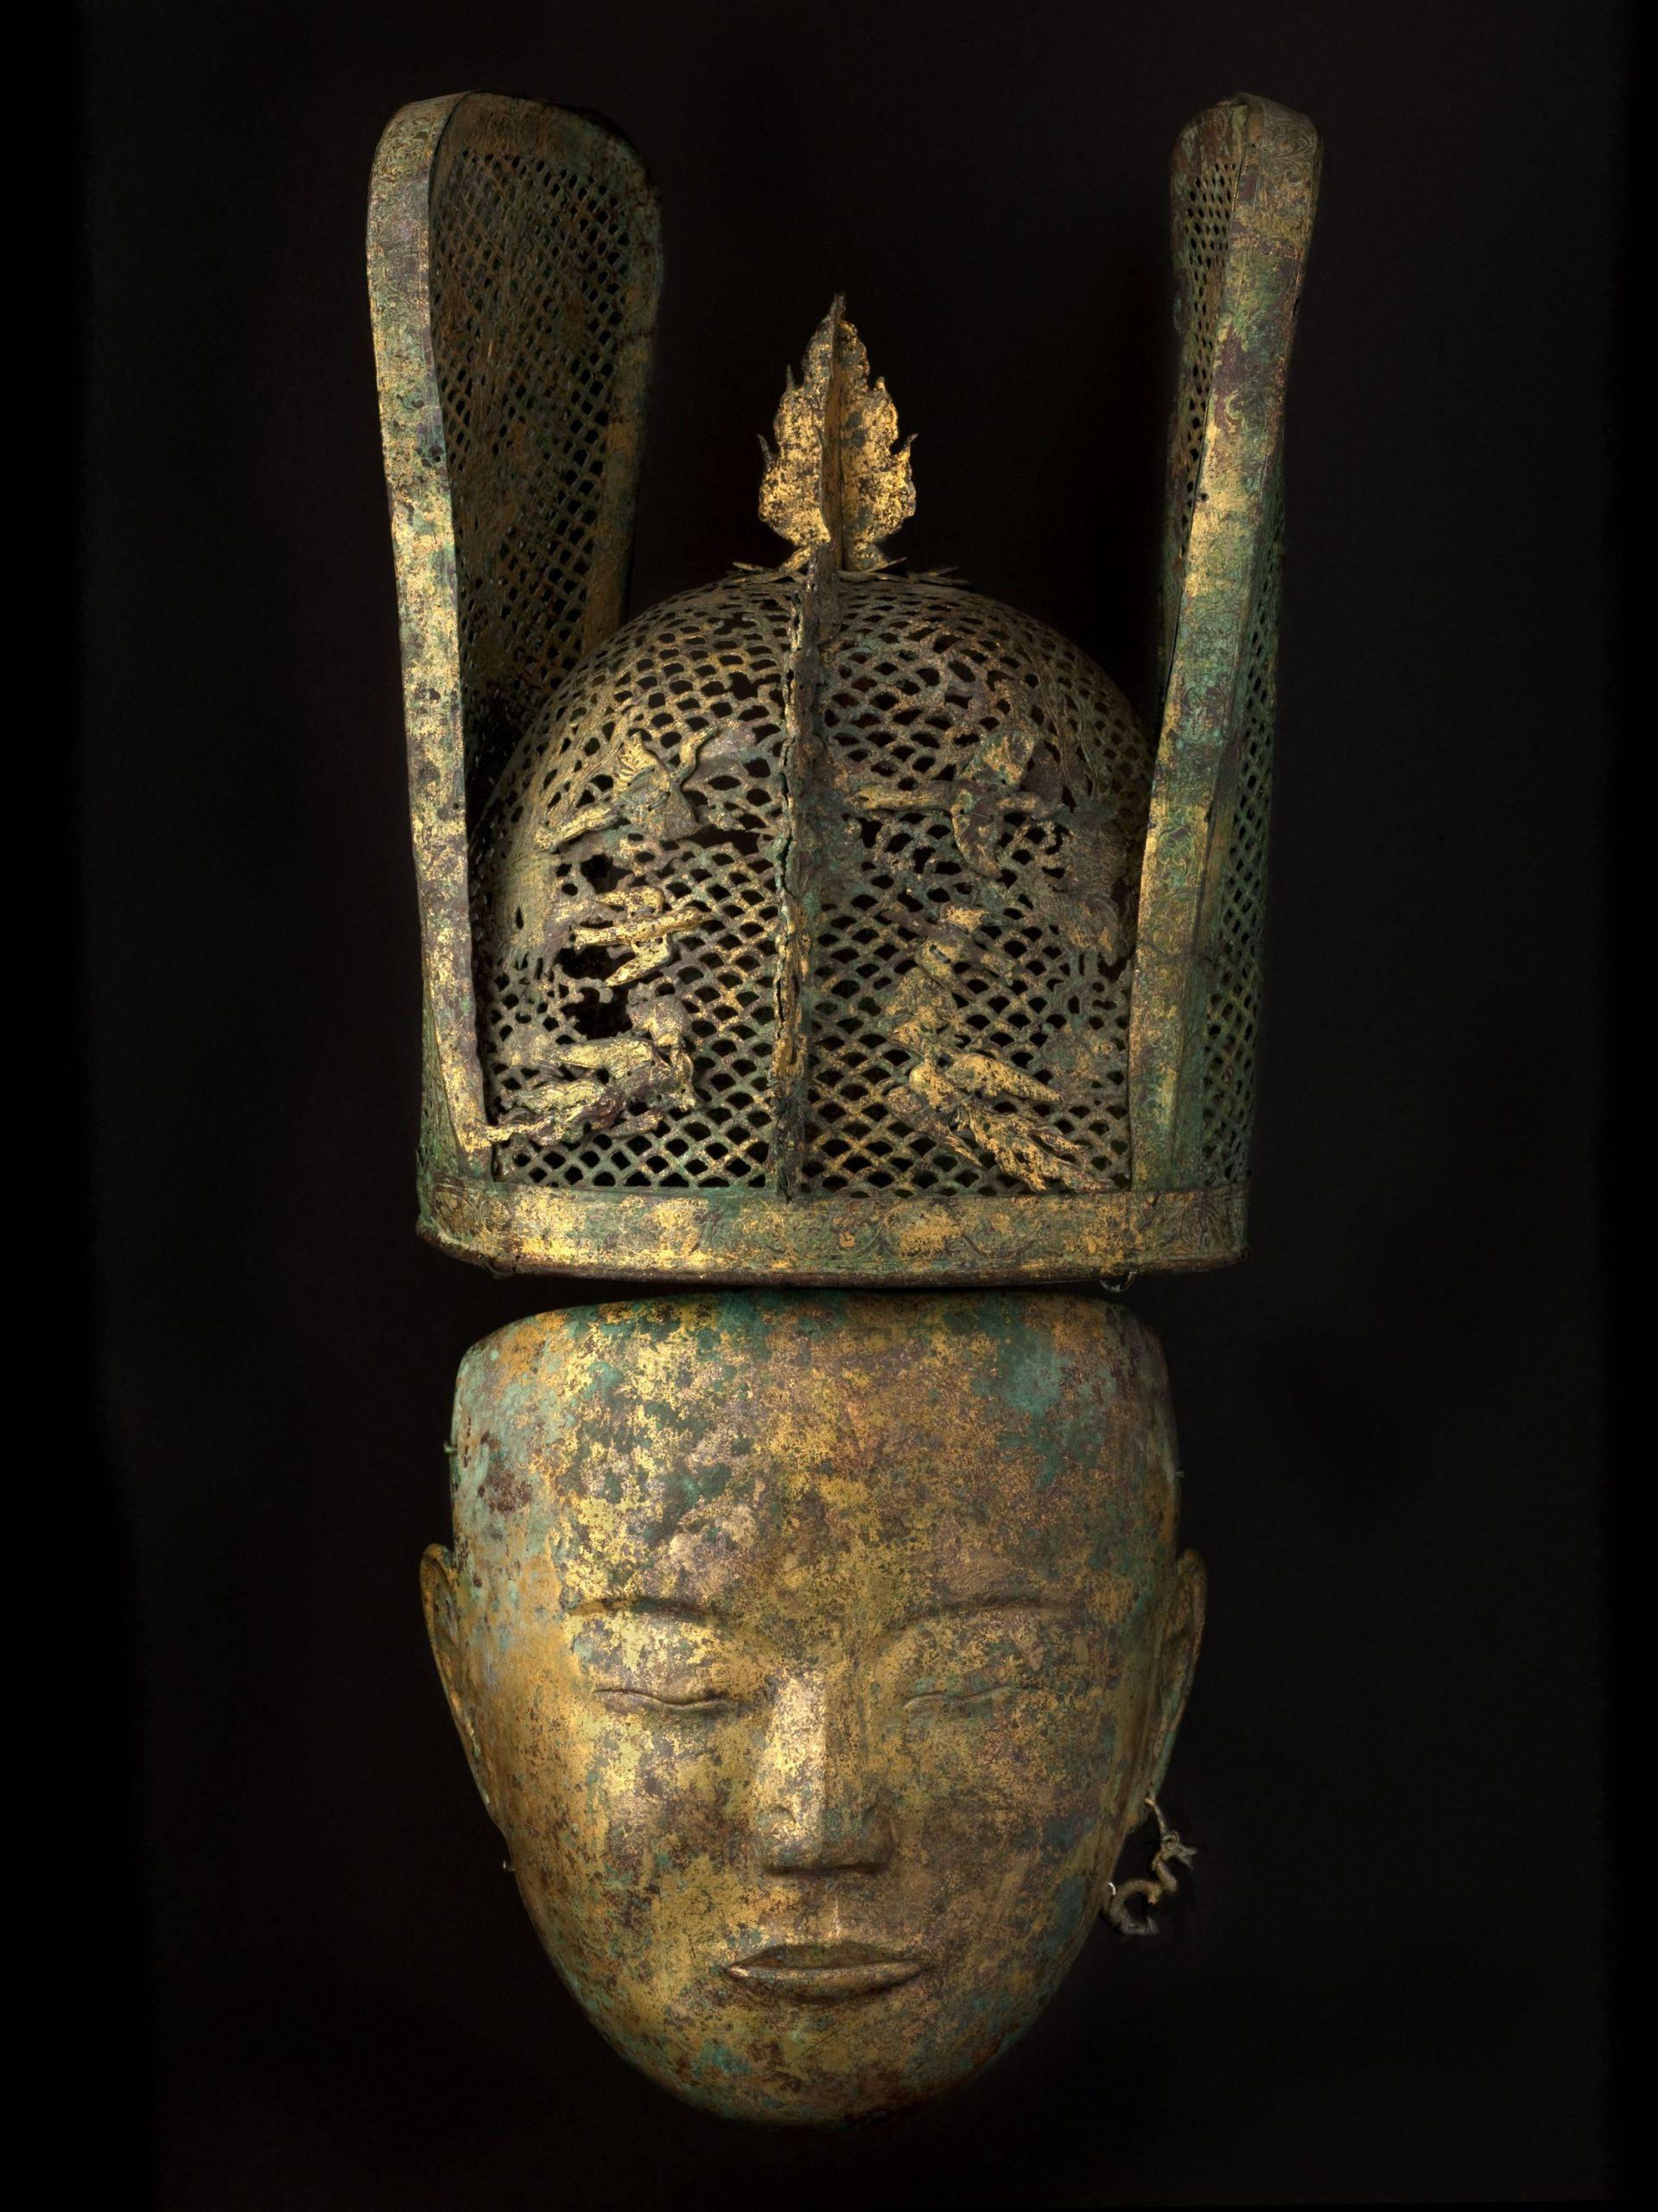 Masque féminin funéraire, bronze, dorure, dynastie des Liao